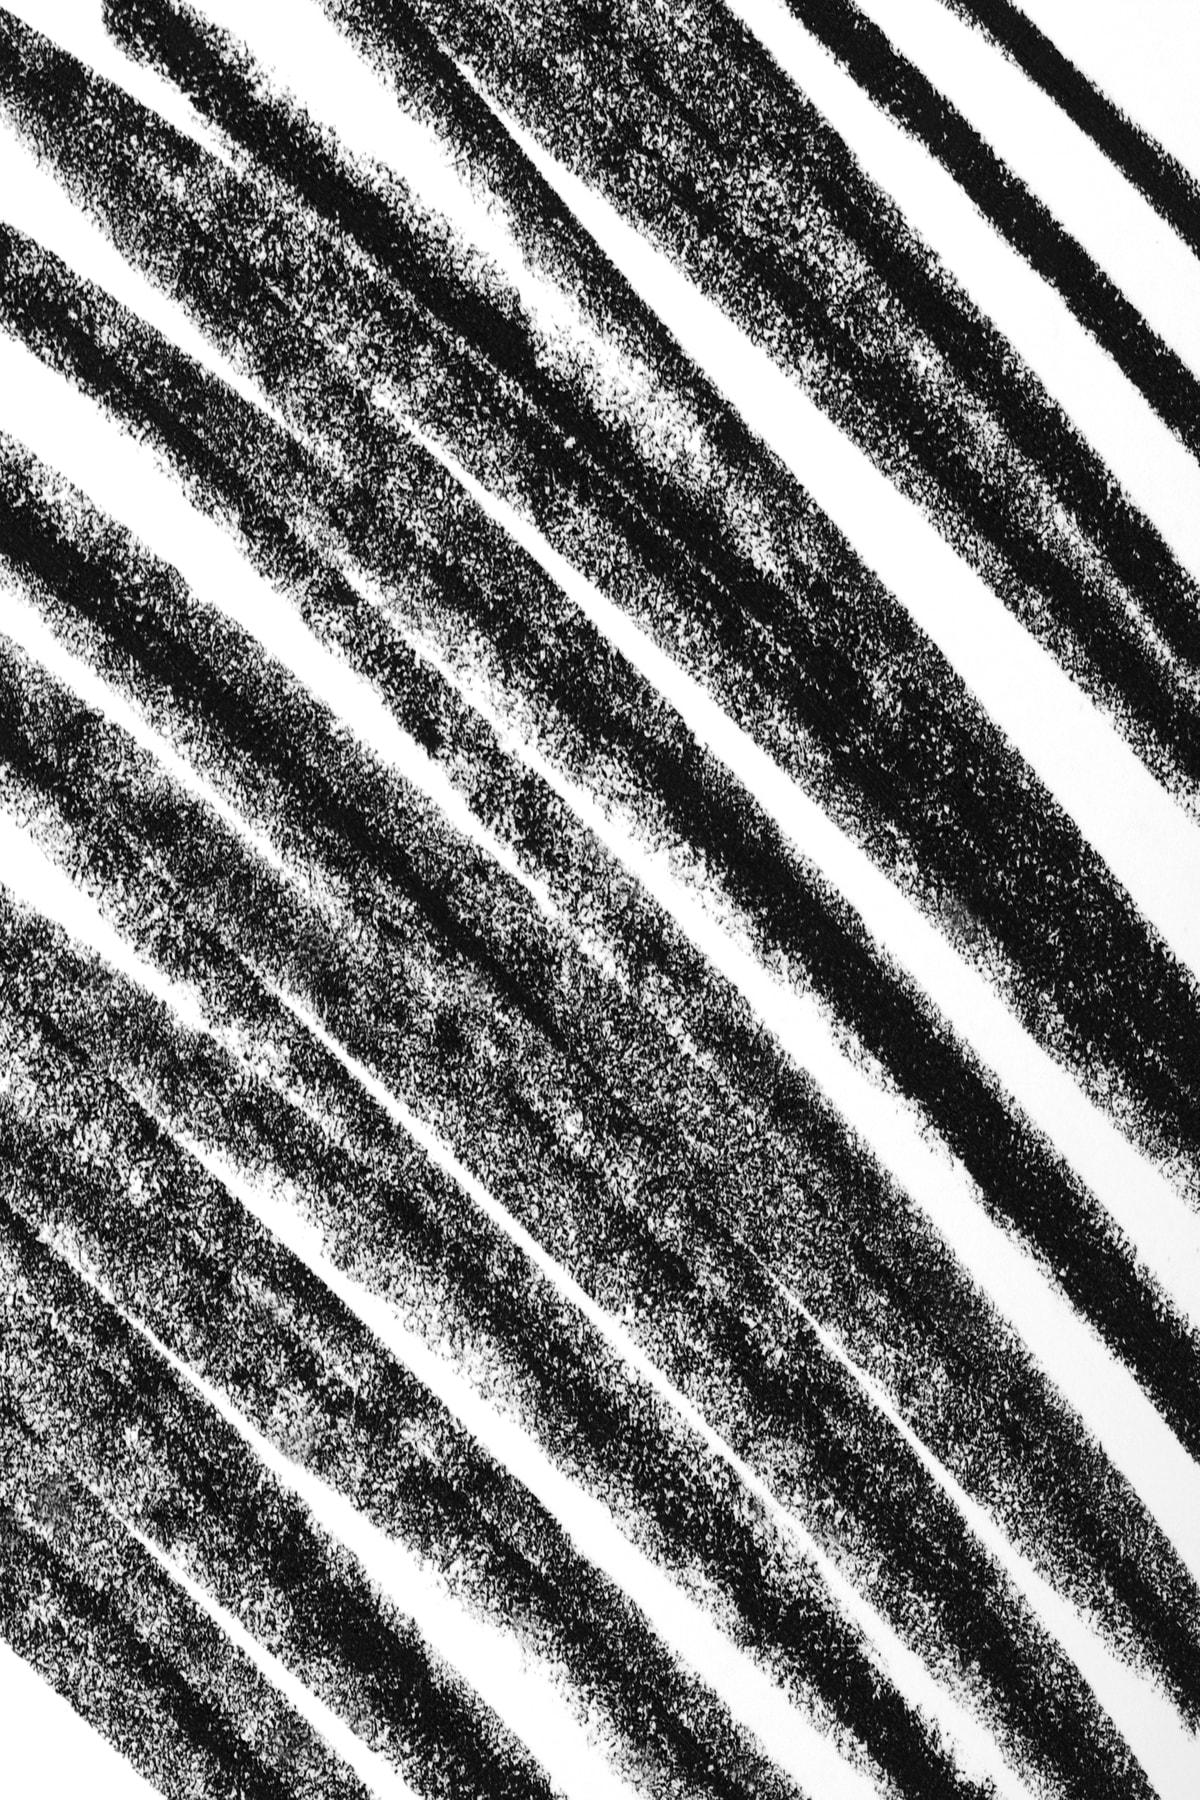 INGLOT Göz Kalemi - Eye Pencil 89 1.8 gr 5907587103894 2